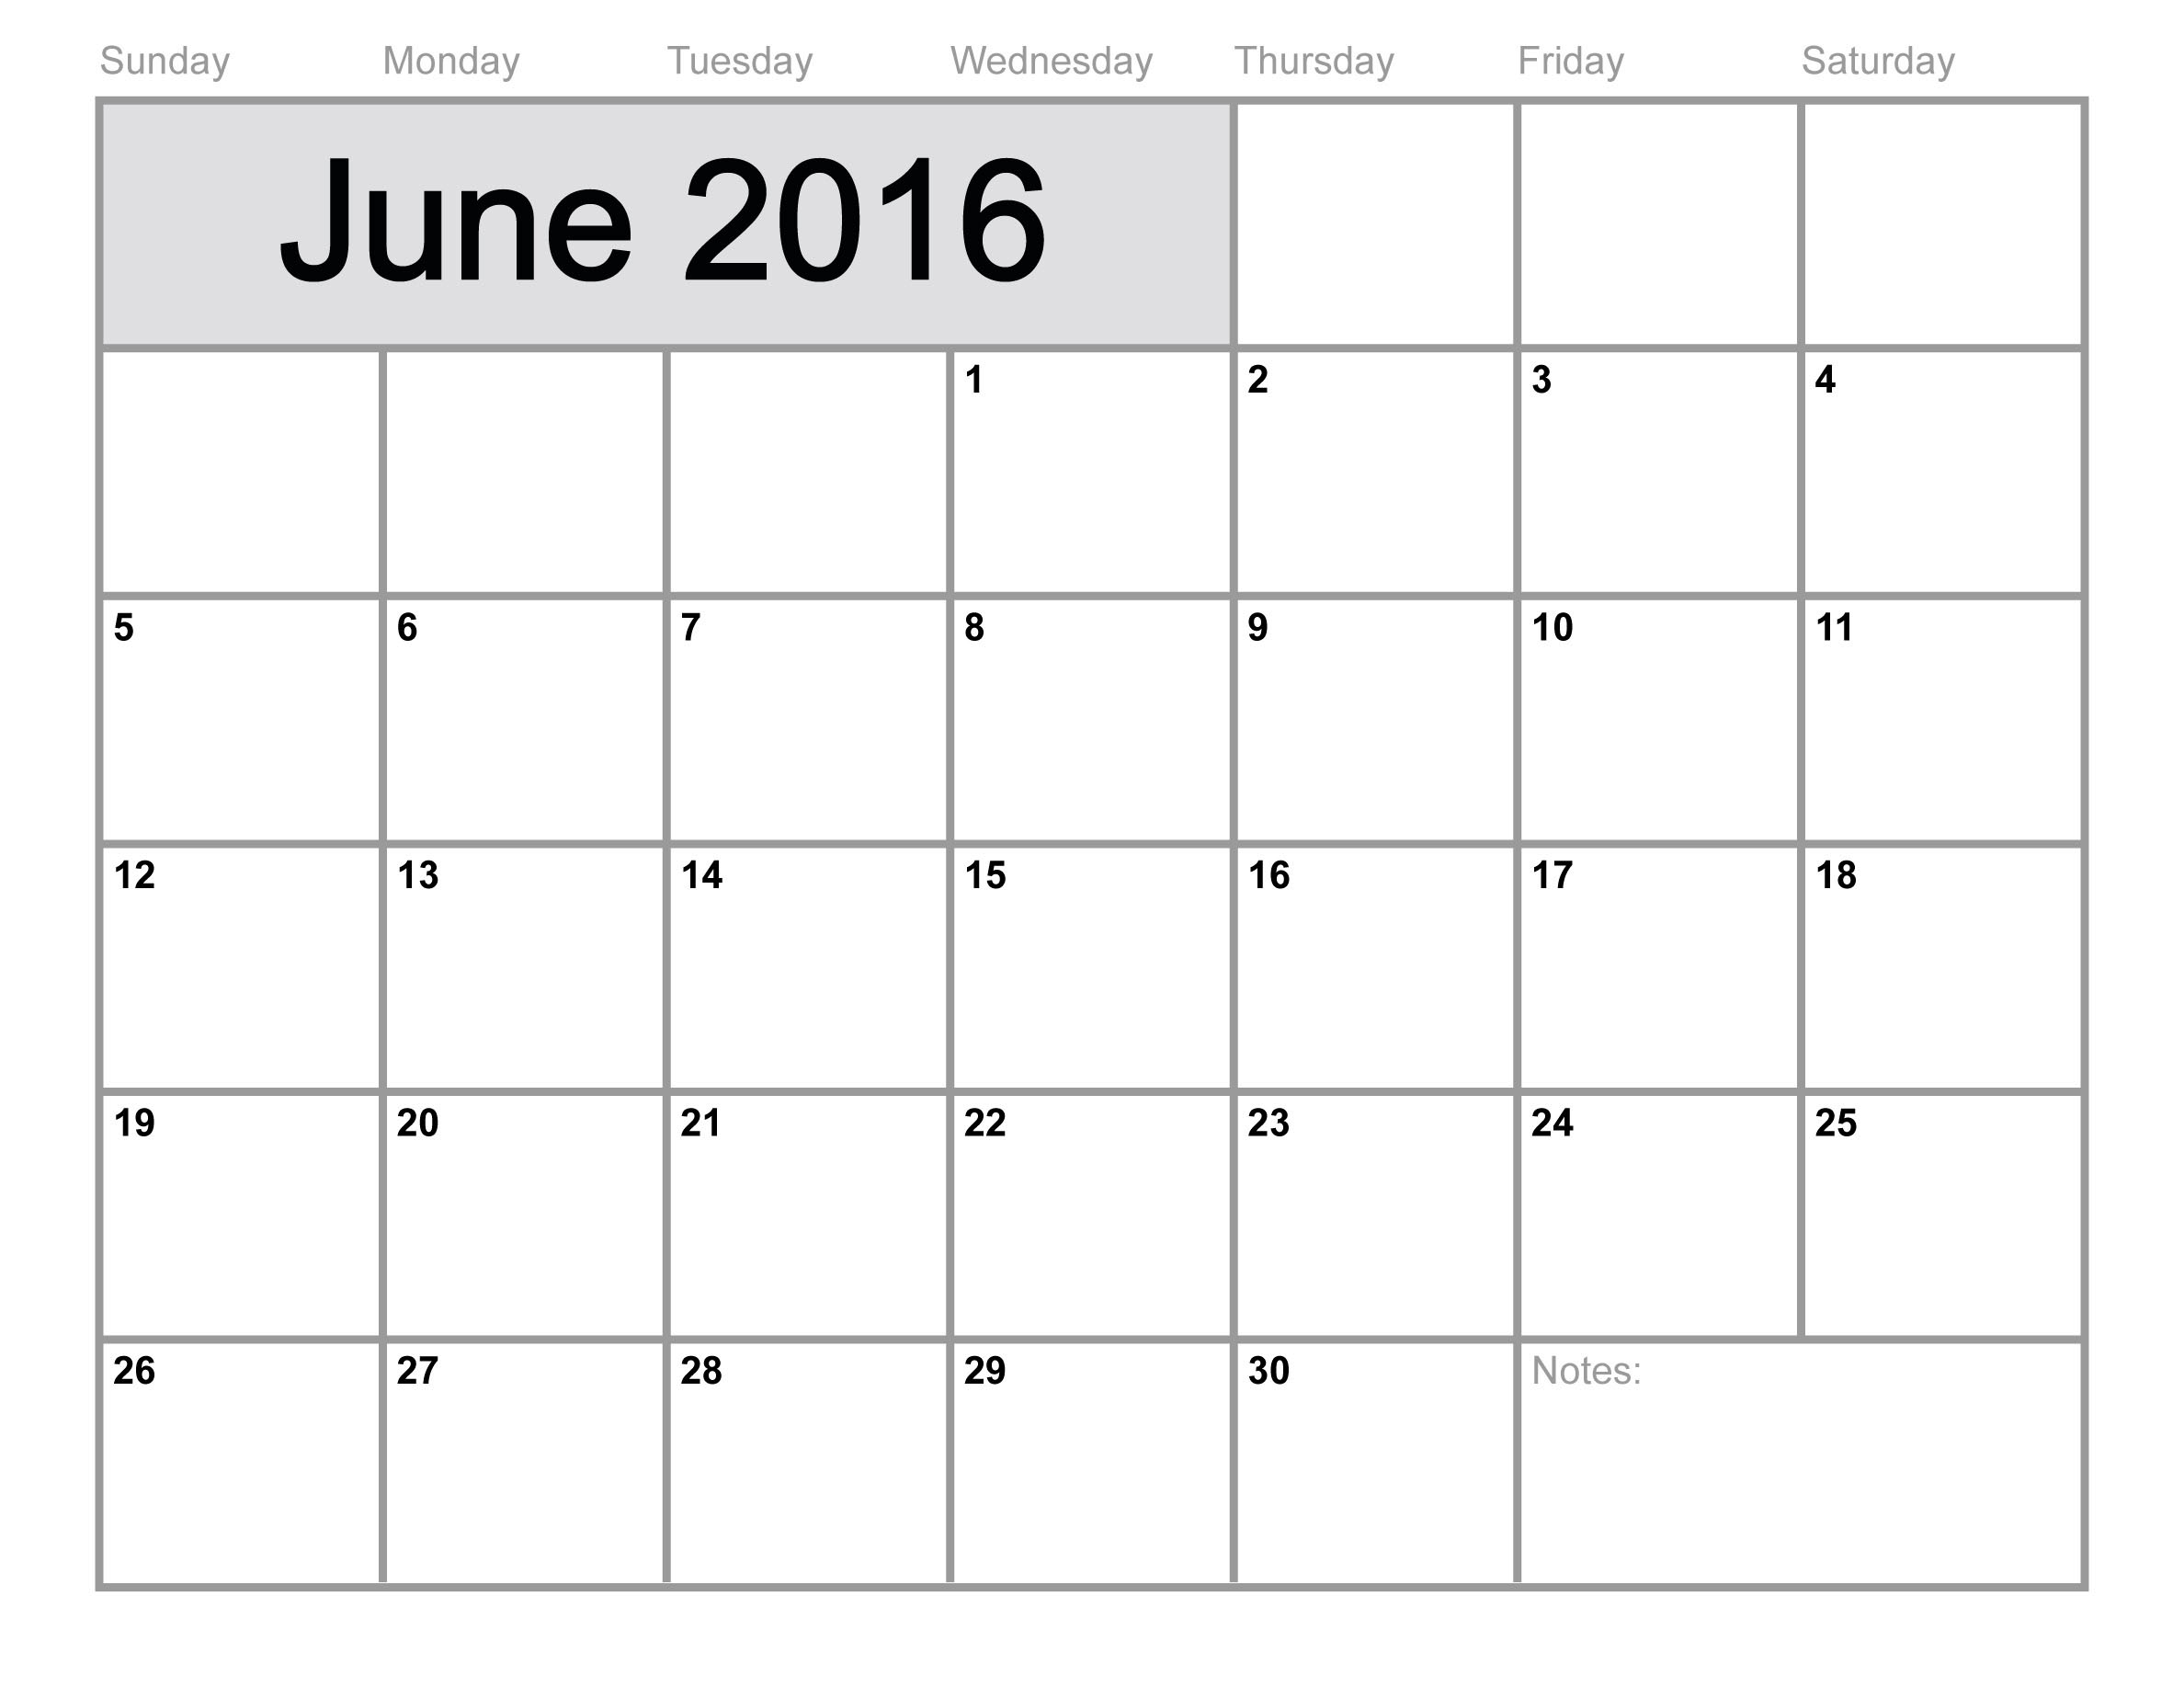 -2016-june-calendar-template-june-2016-calendar-printable-free-blank ...